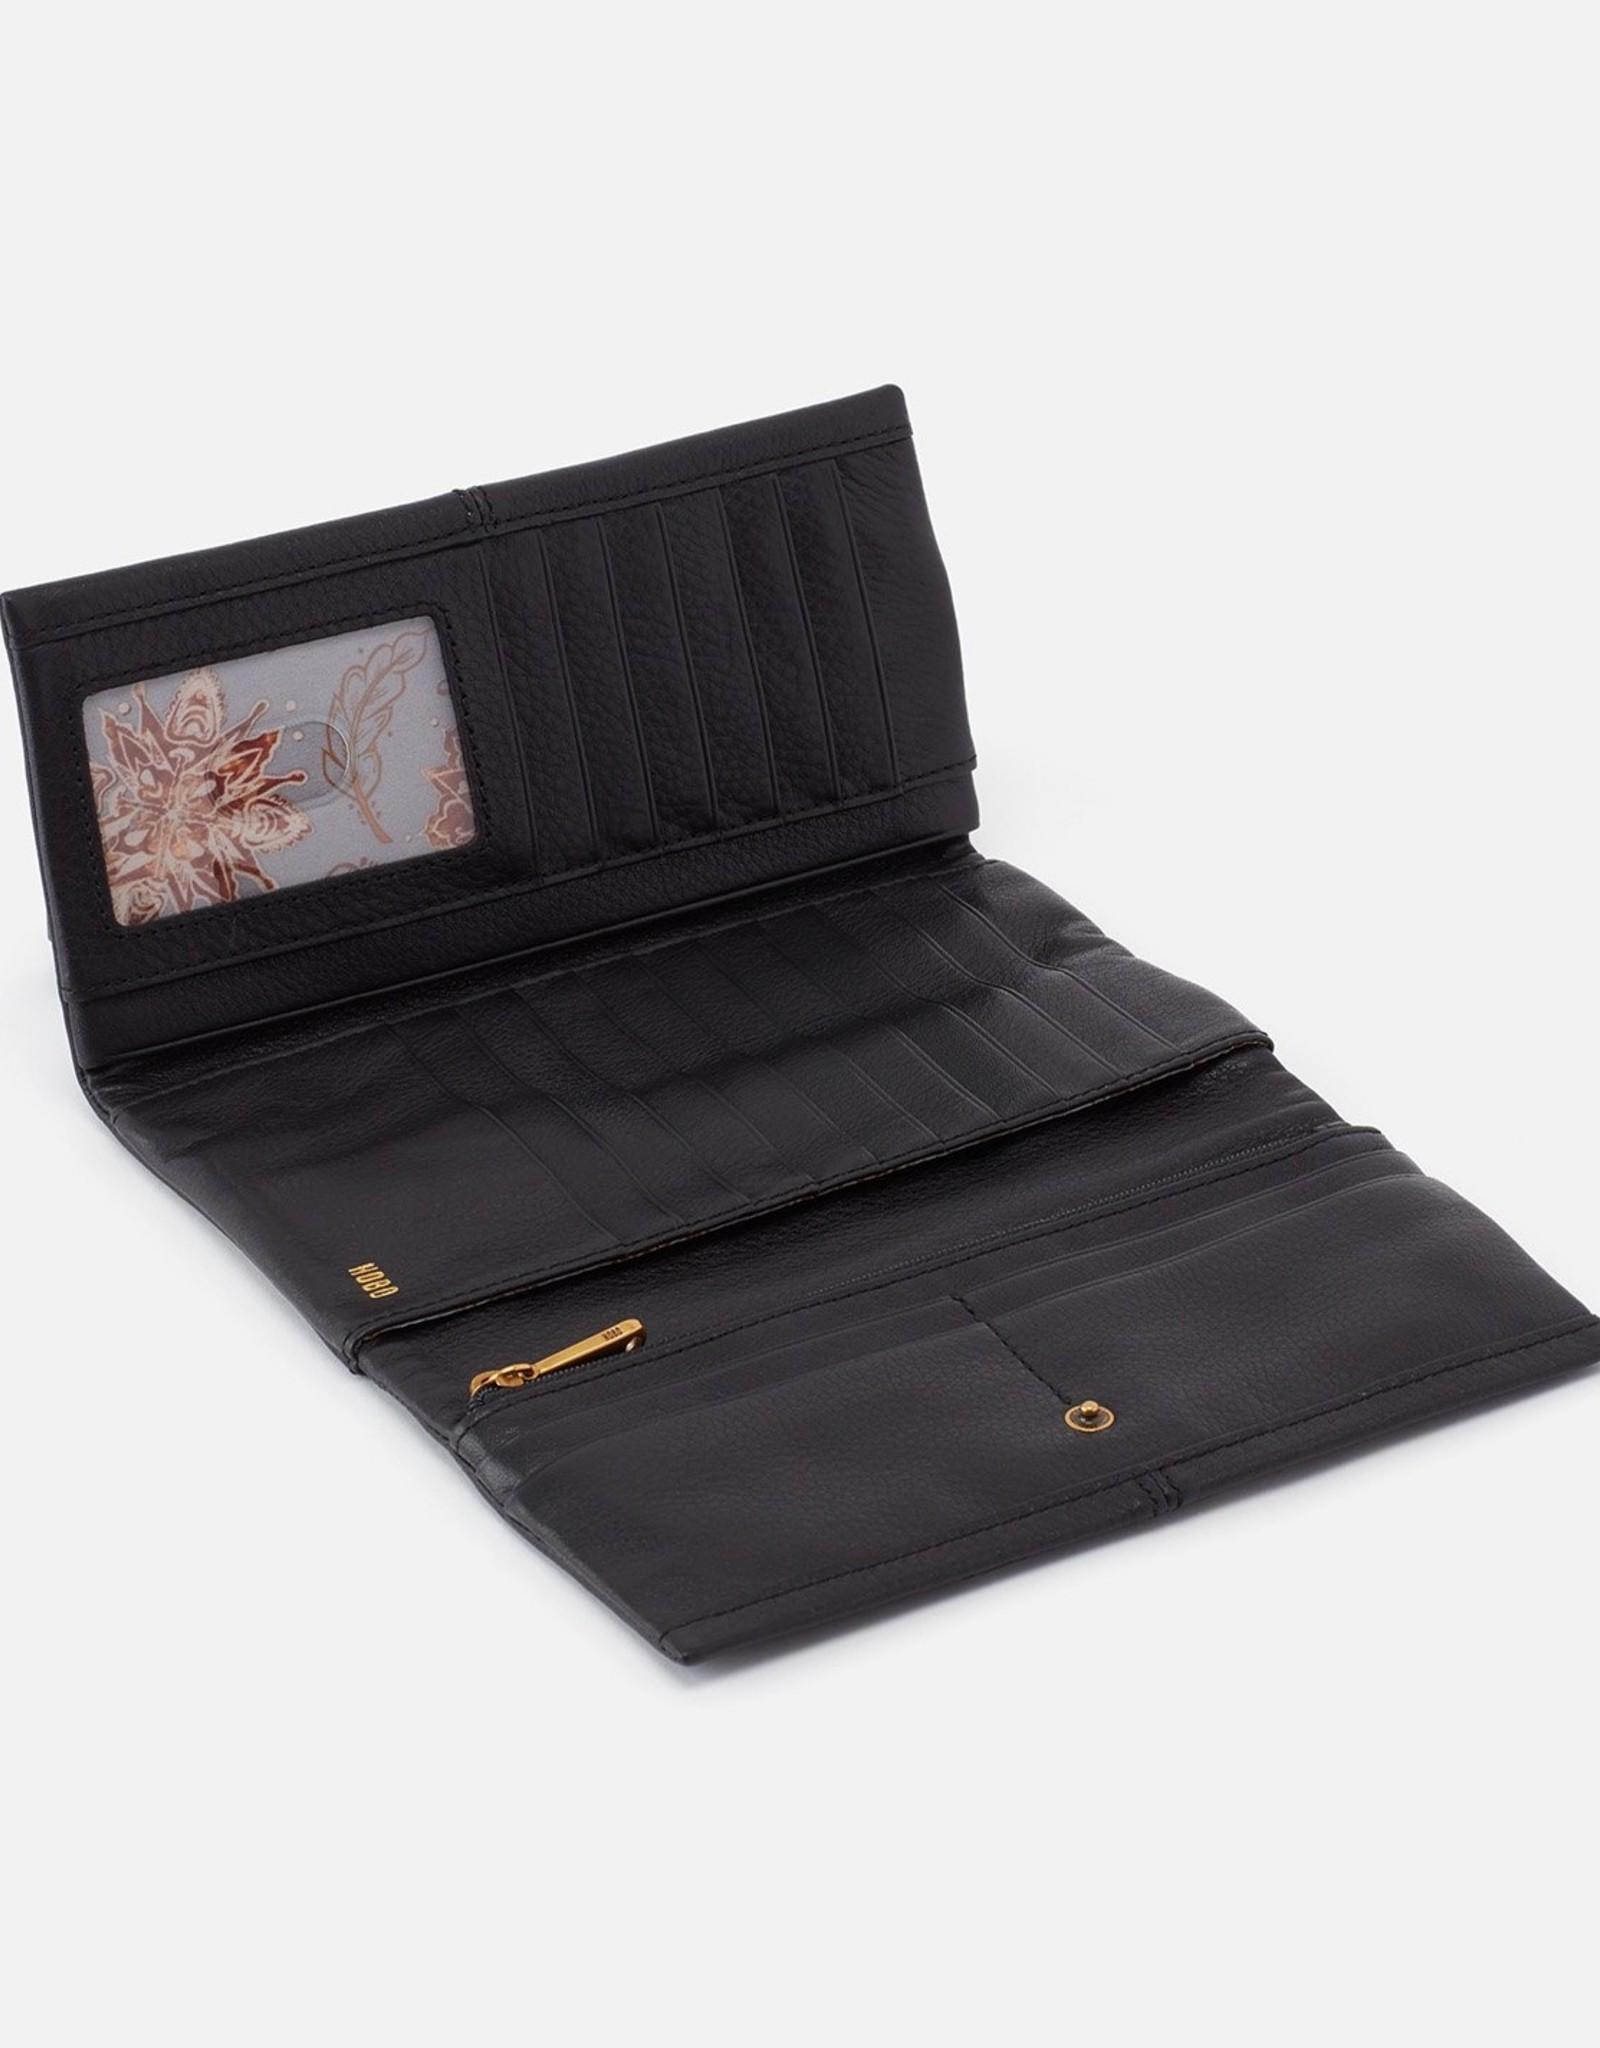 Hobo Keen Continental Wallet